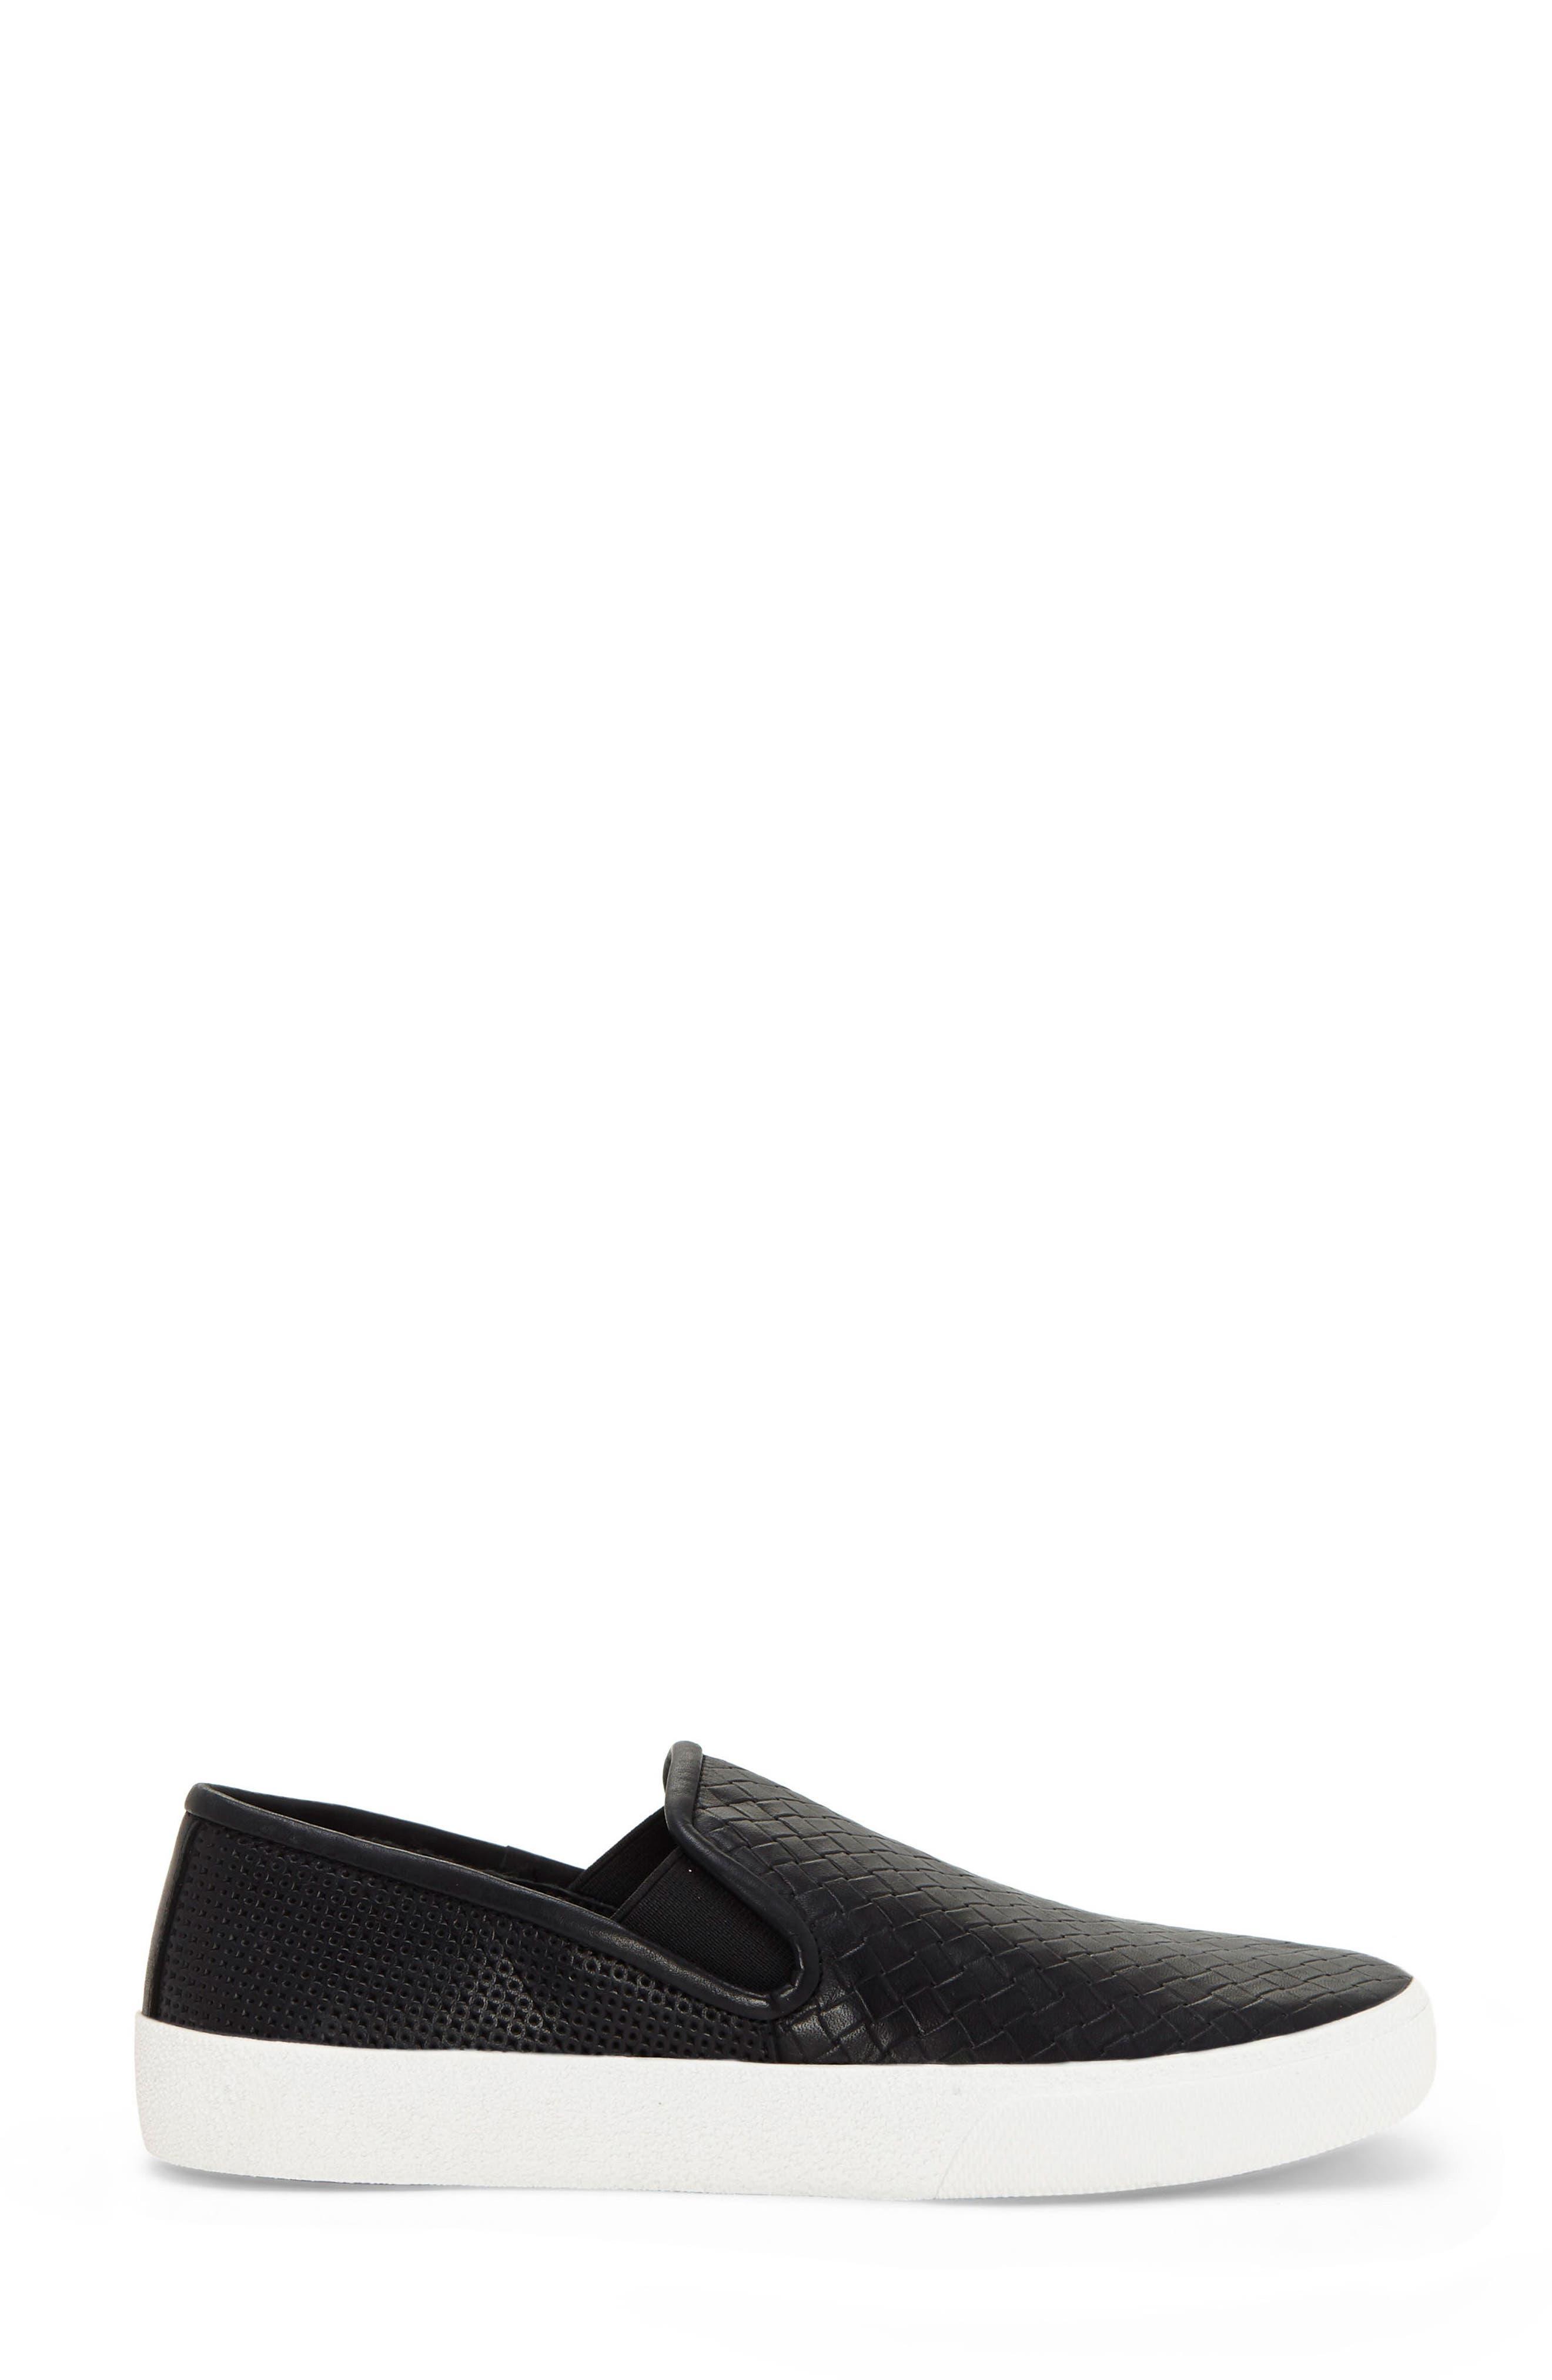 Cariana Slip-On Sneaker,                             Alternate thumbnail 3, color,                             001